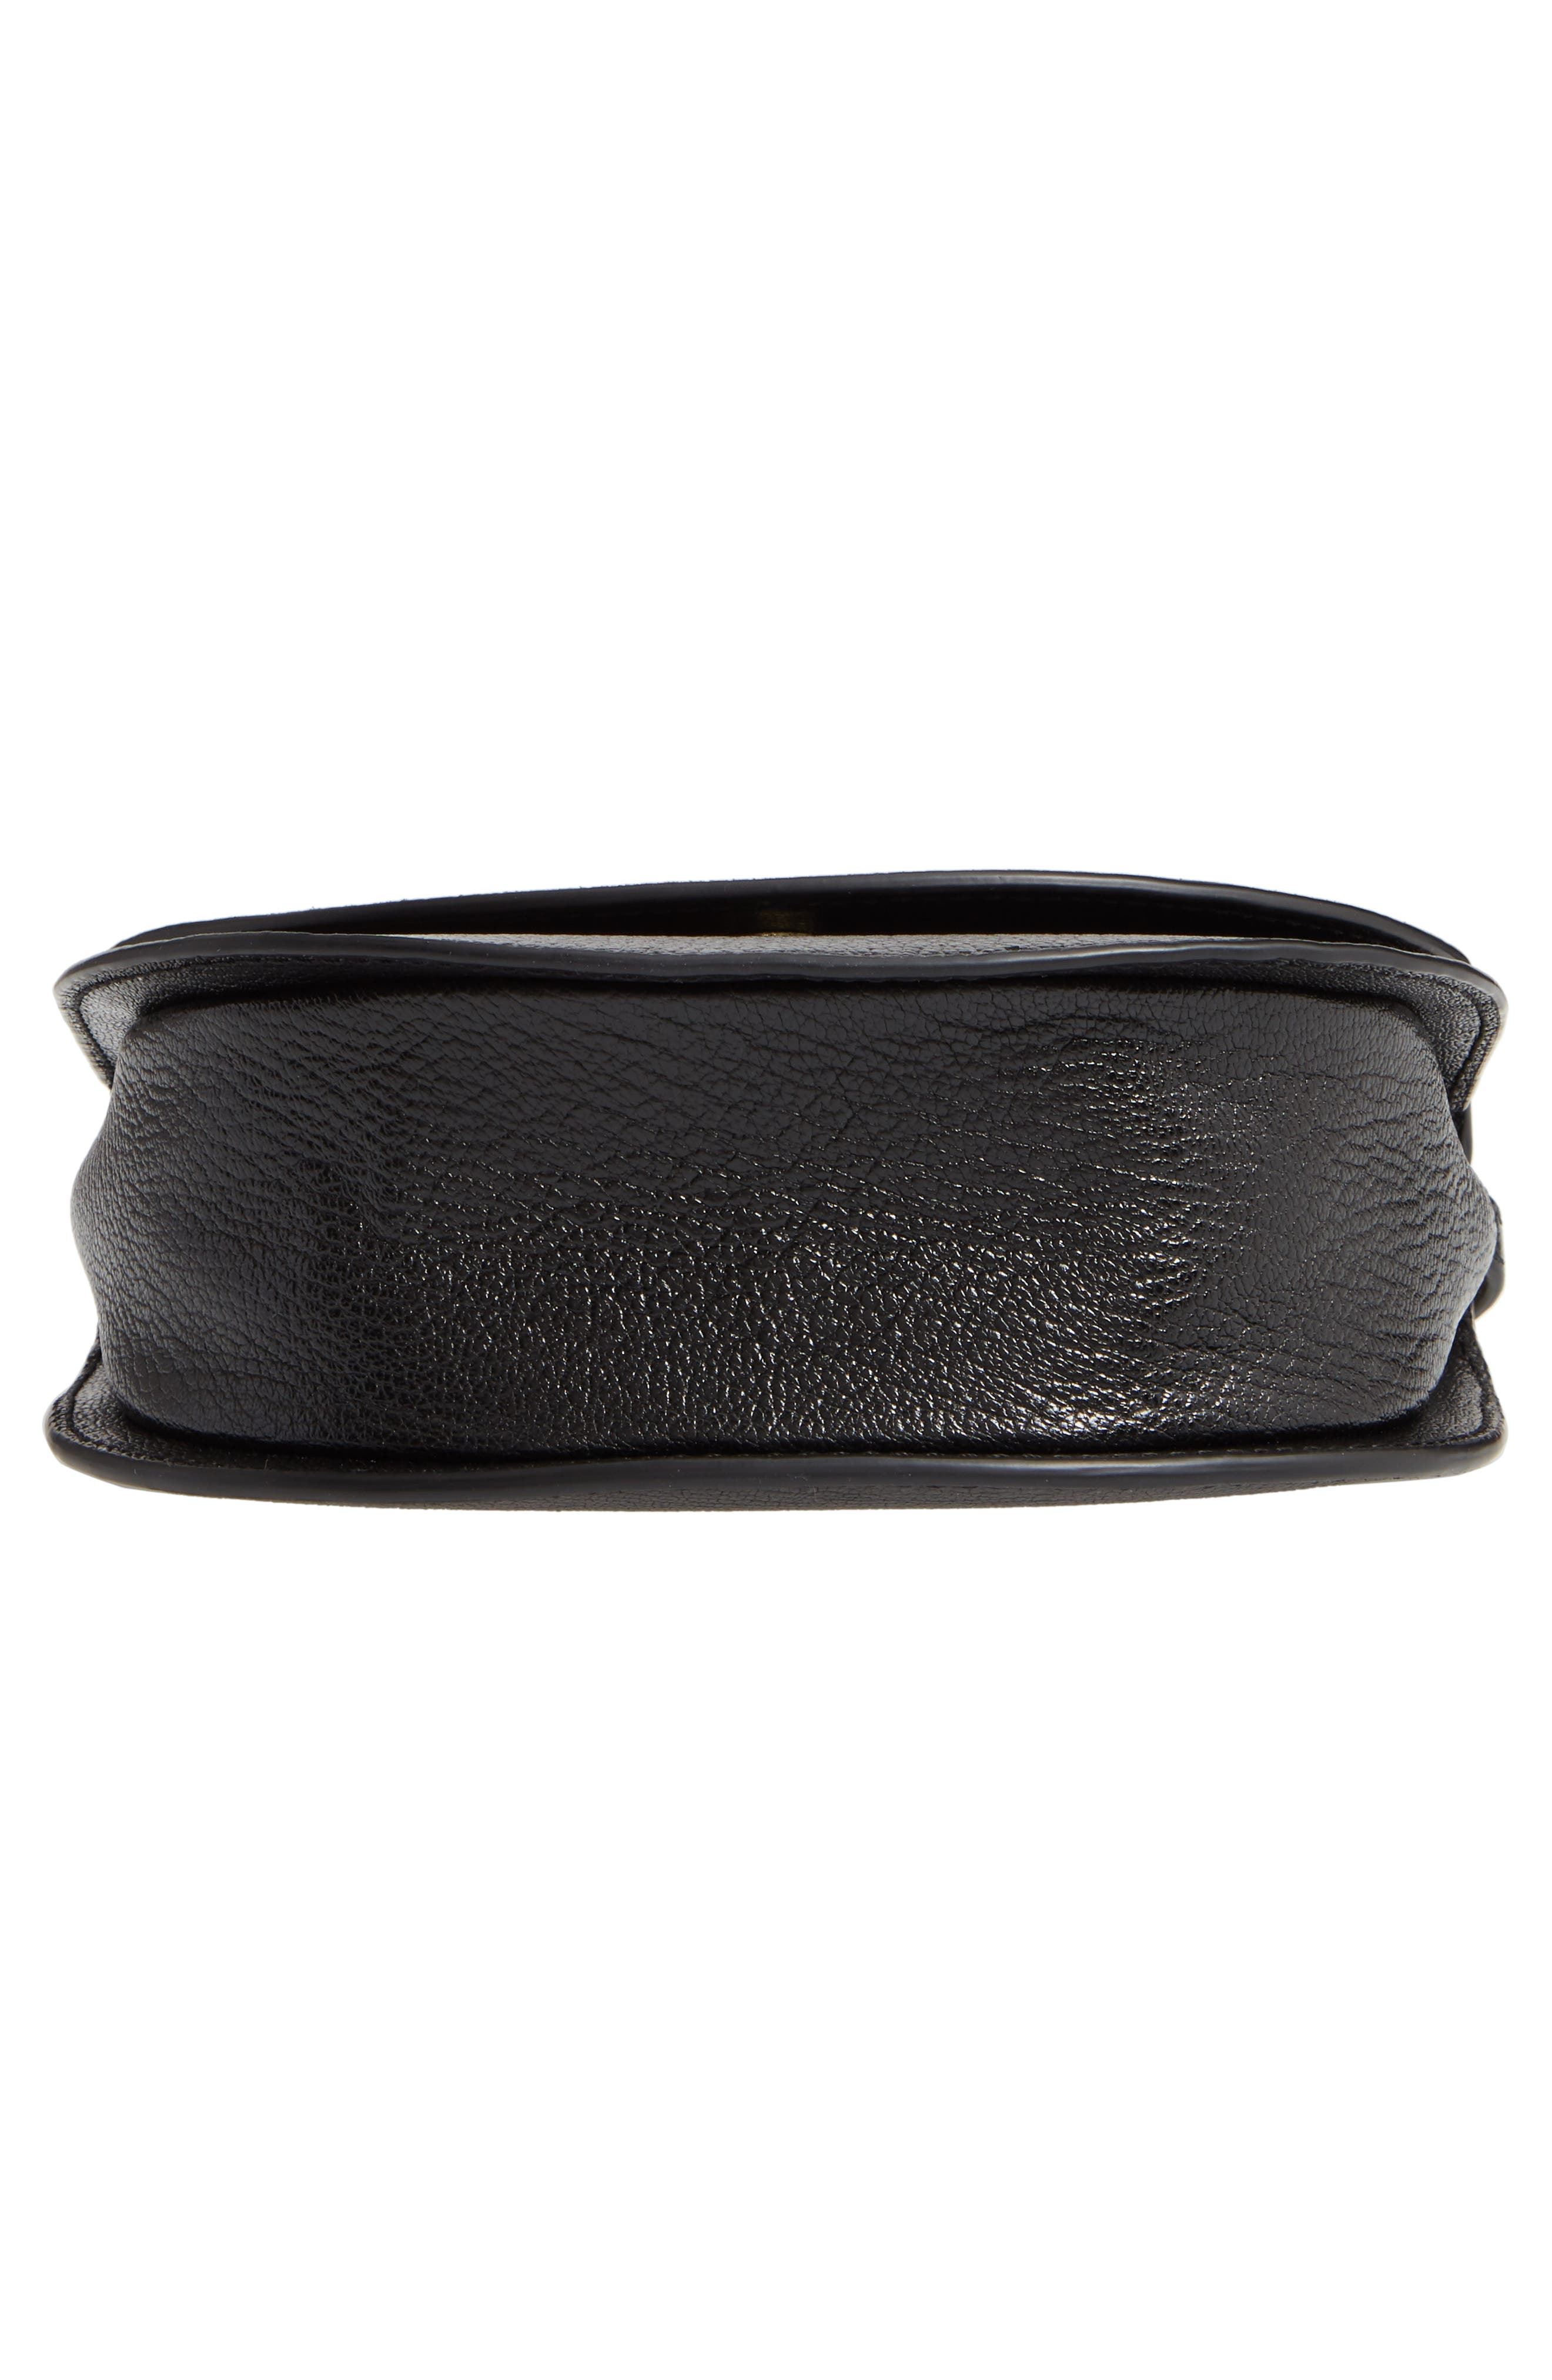 Half Moon Lux Calfskin Leather Crossbody Bag,                             Alternate thumbnail 6, color,                             001